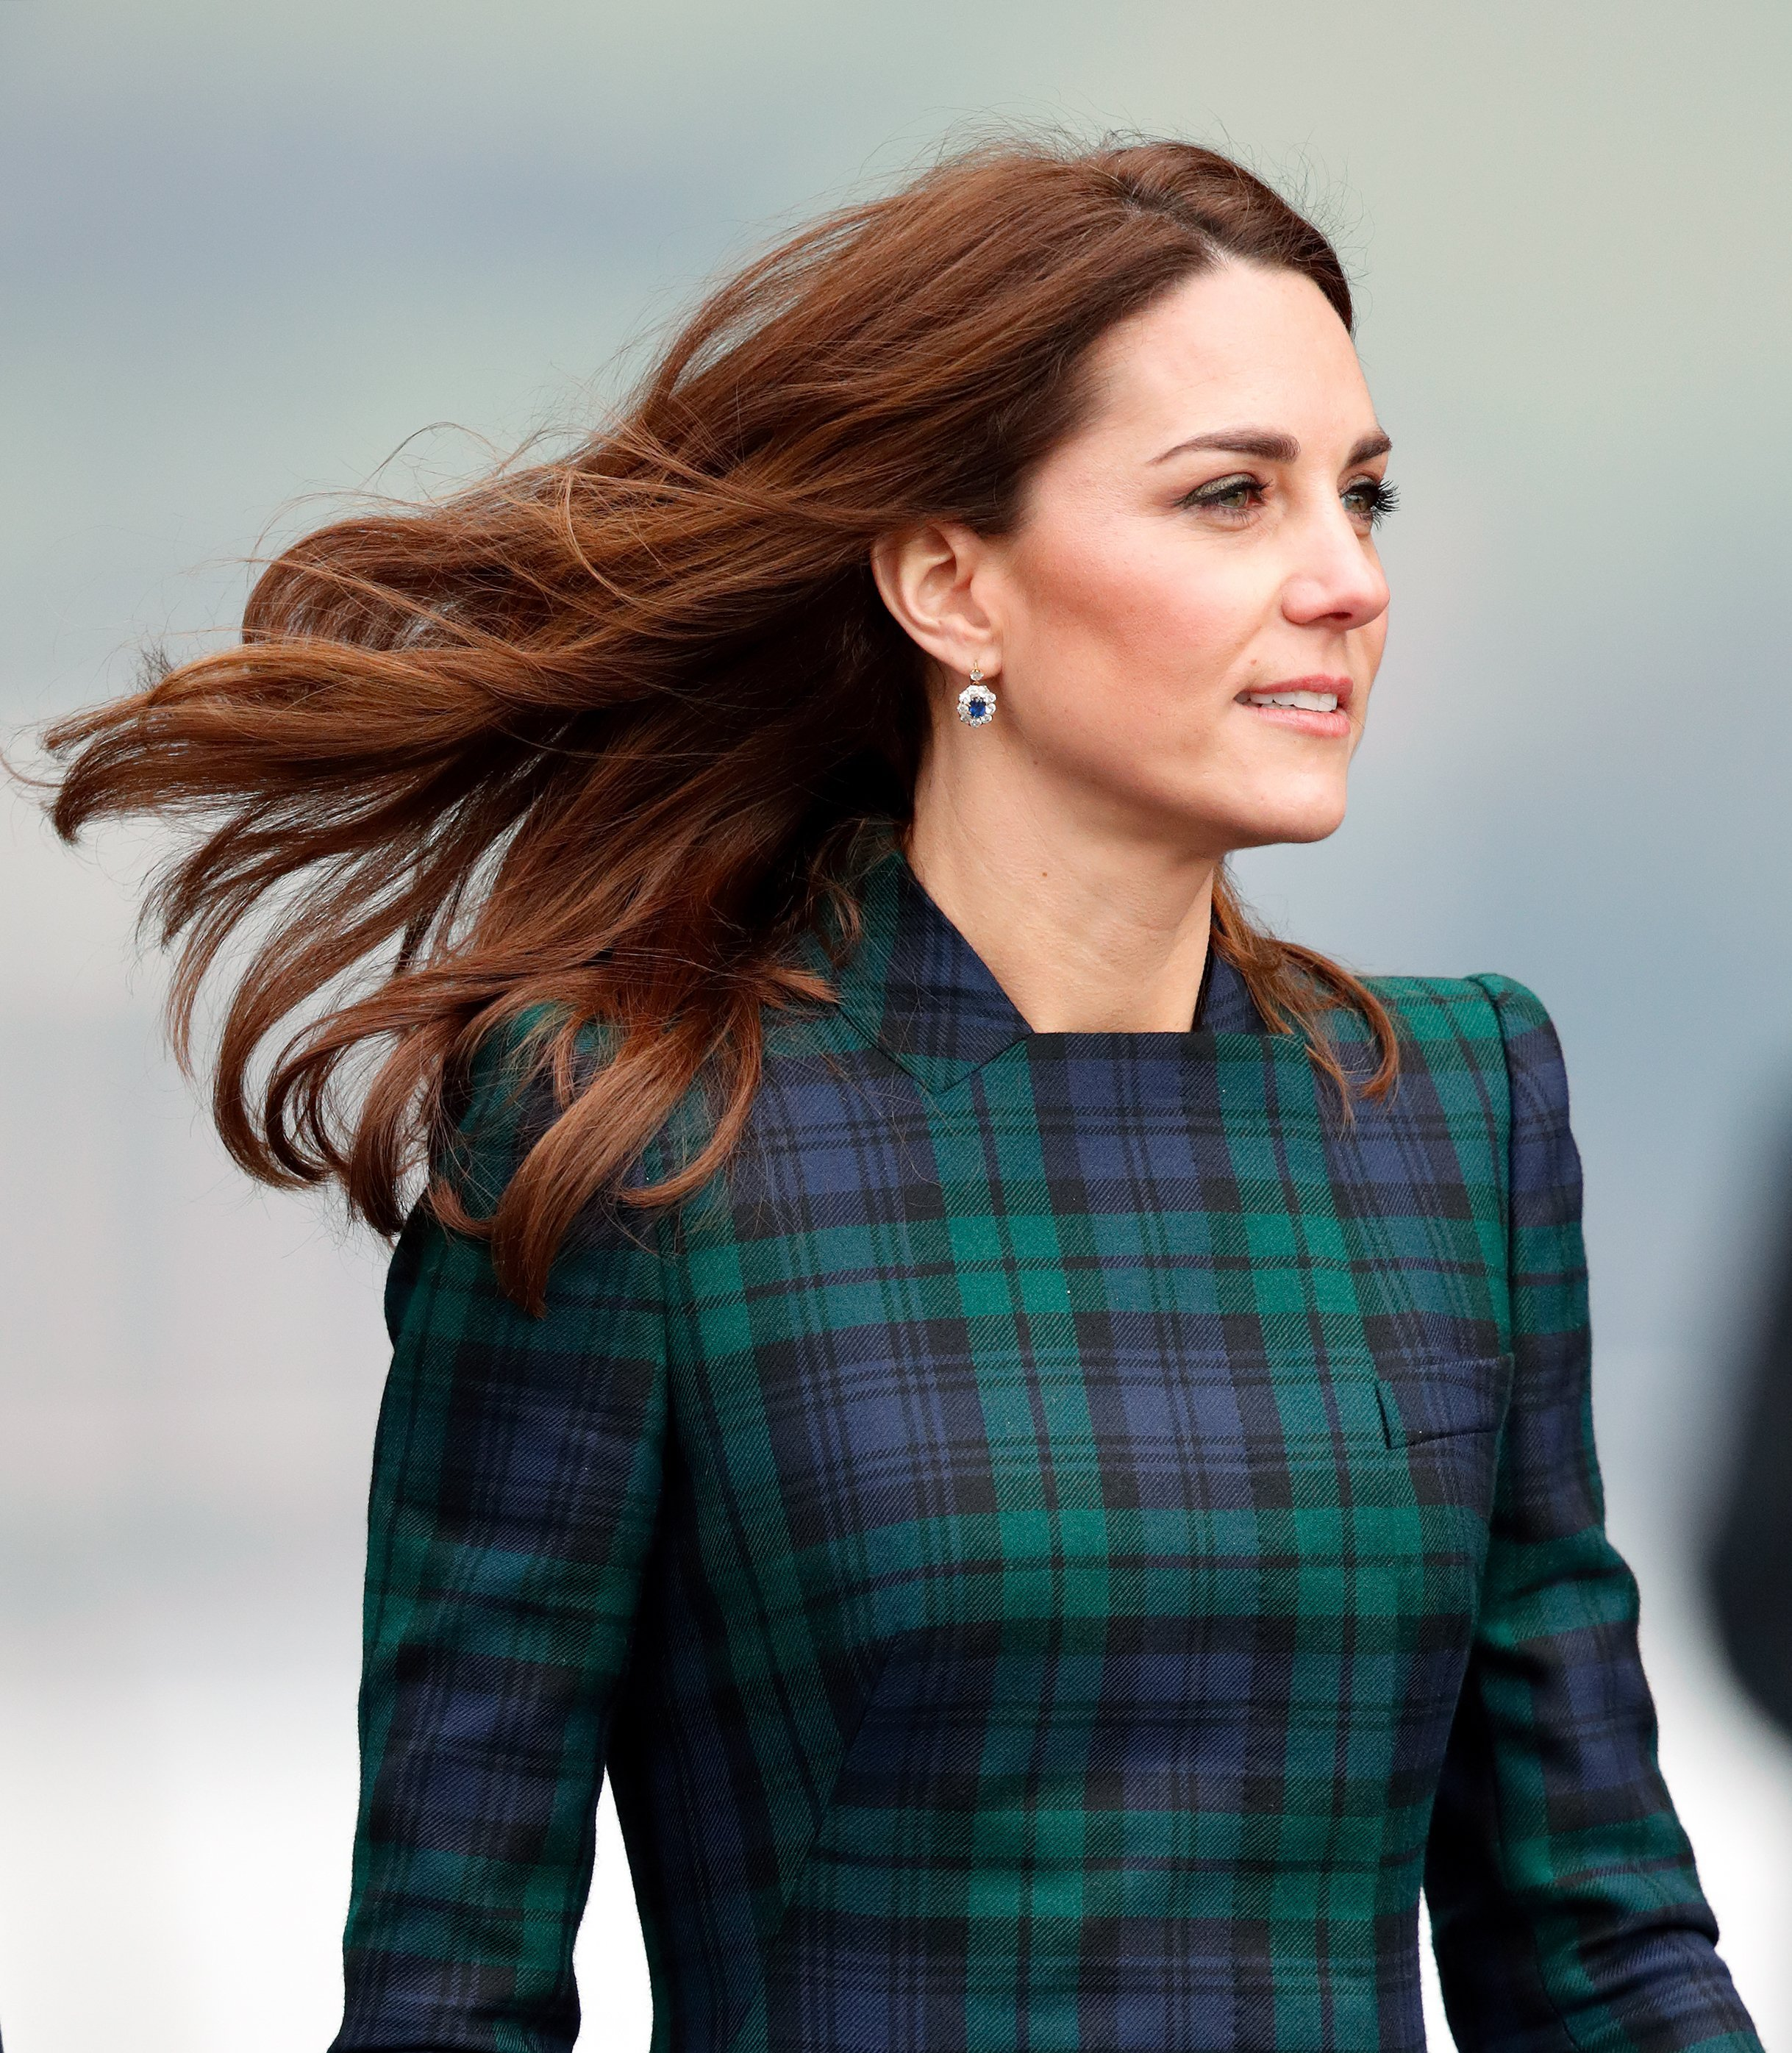 La chevelure brillante de Kate Middleton. l Source: Getty Images